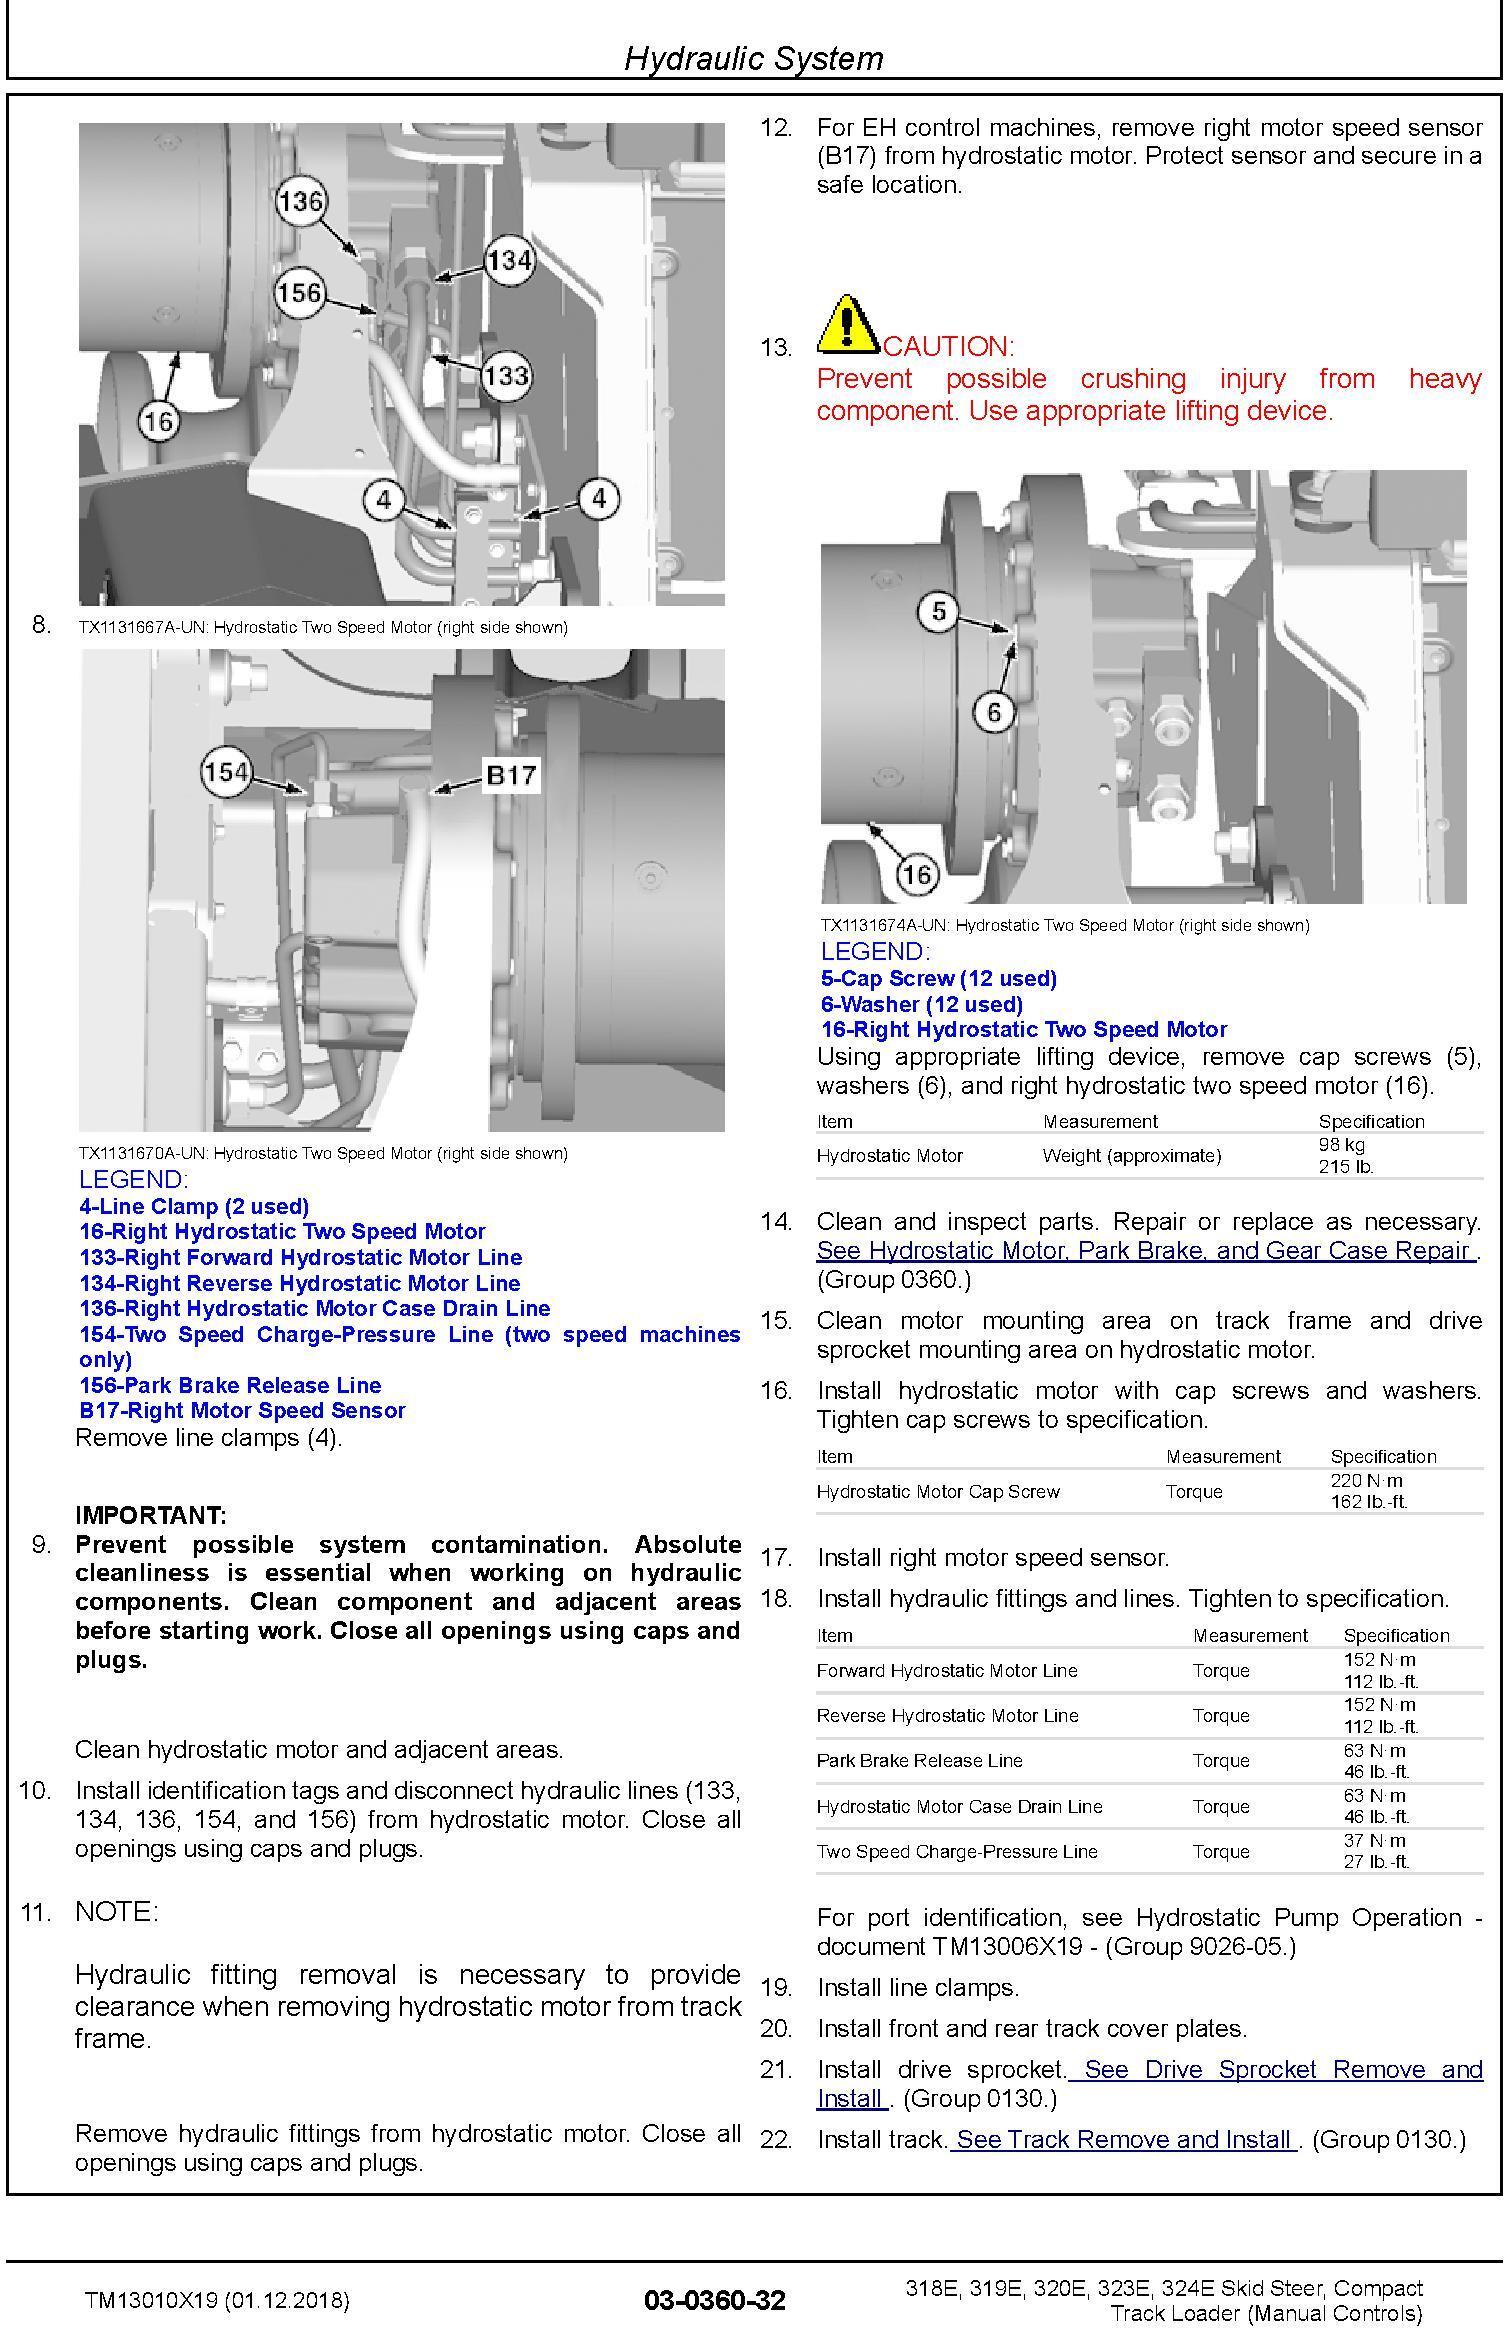 TM13010X19 - John Deere 318E, 319E, 320E, 323E, 324E Compact Loader w.Manual Controls Repair Manual - 3